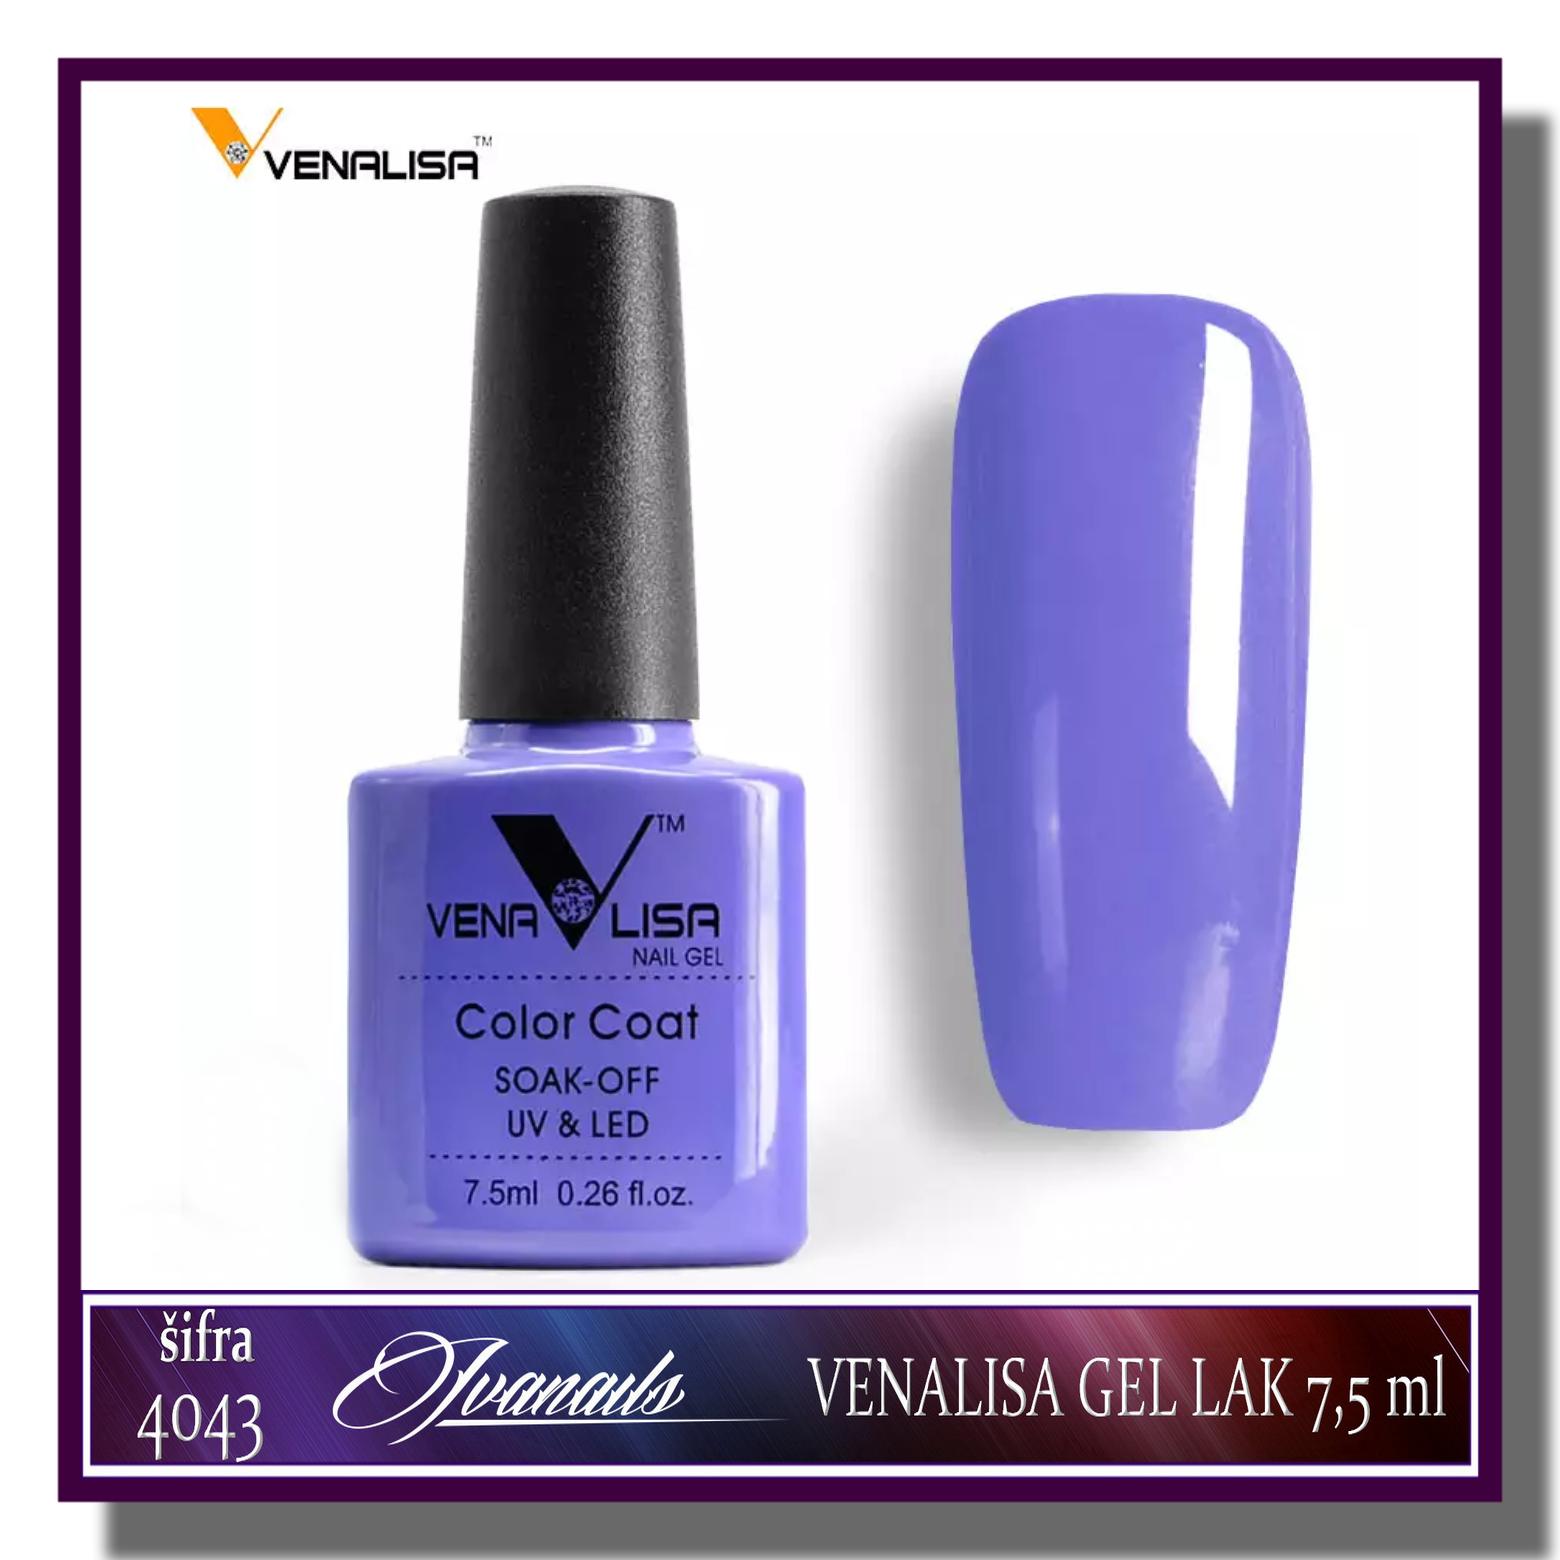 Venalisa Gel Lakovi 4043 Ivanails Cosmetic Shop